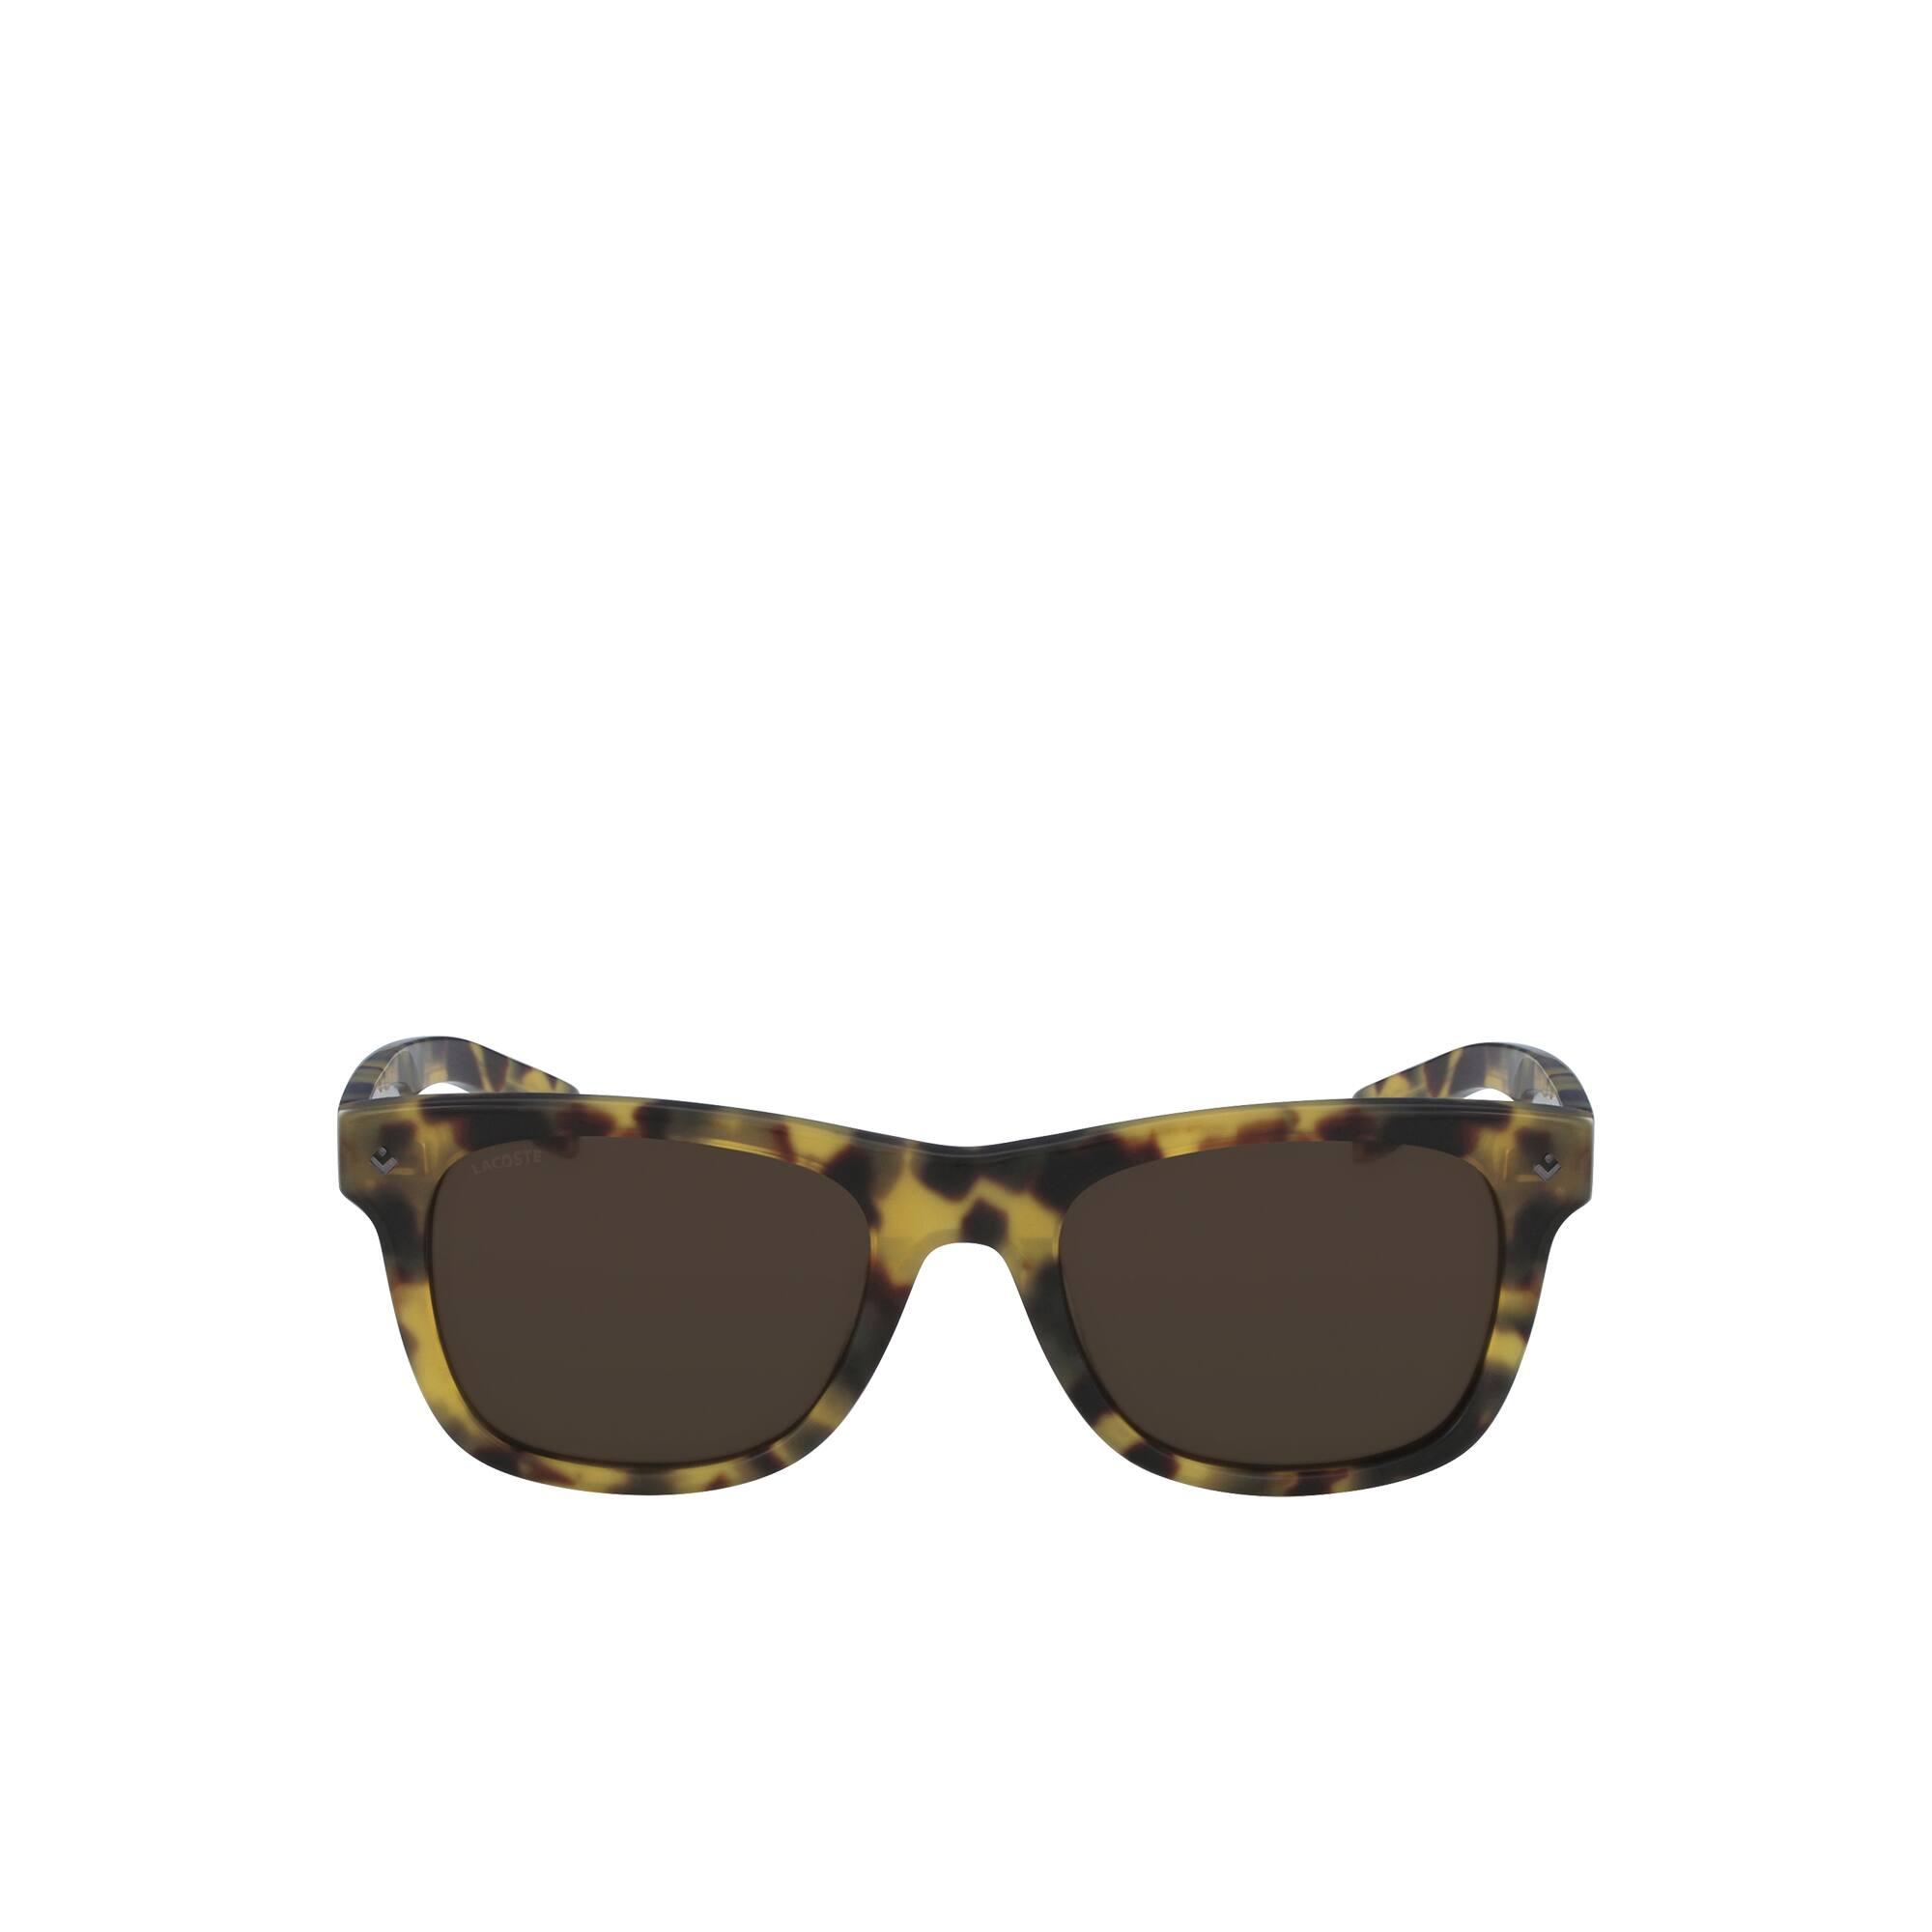 Unisex Petit Piqué Sunglasses 85th anniversary with Acetate Frames